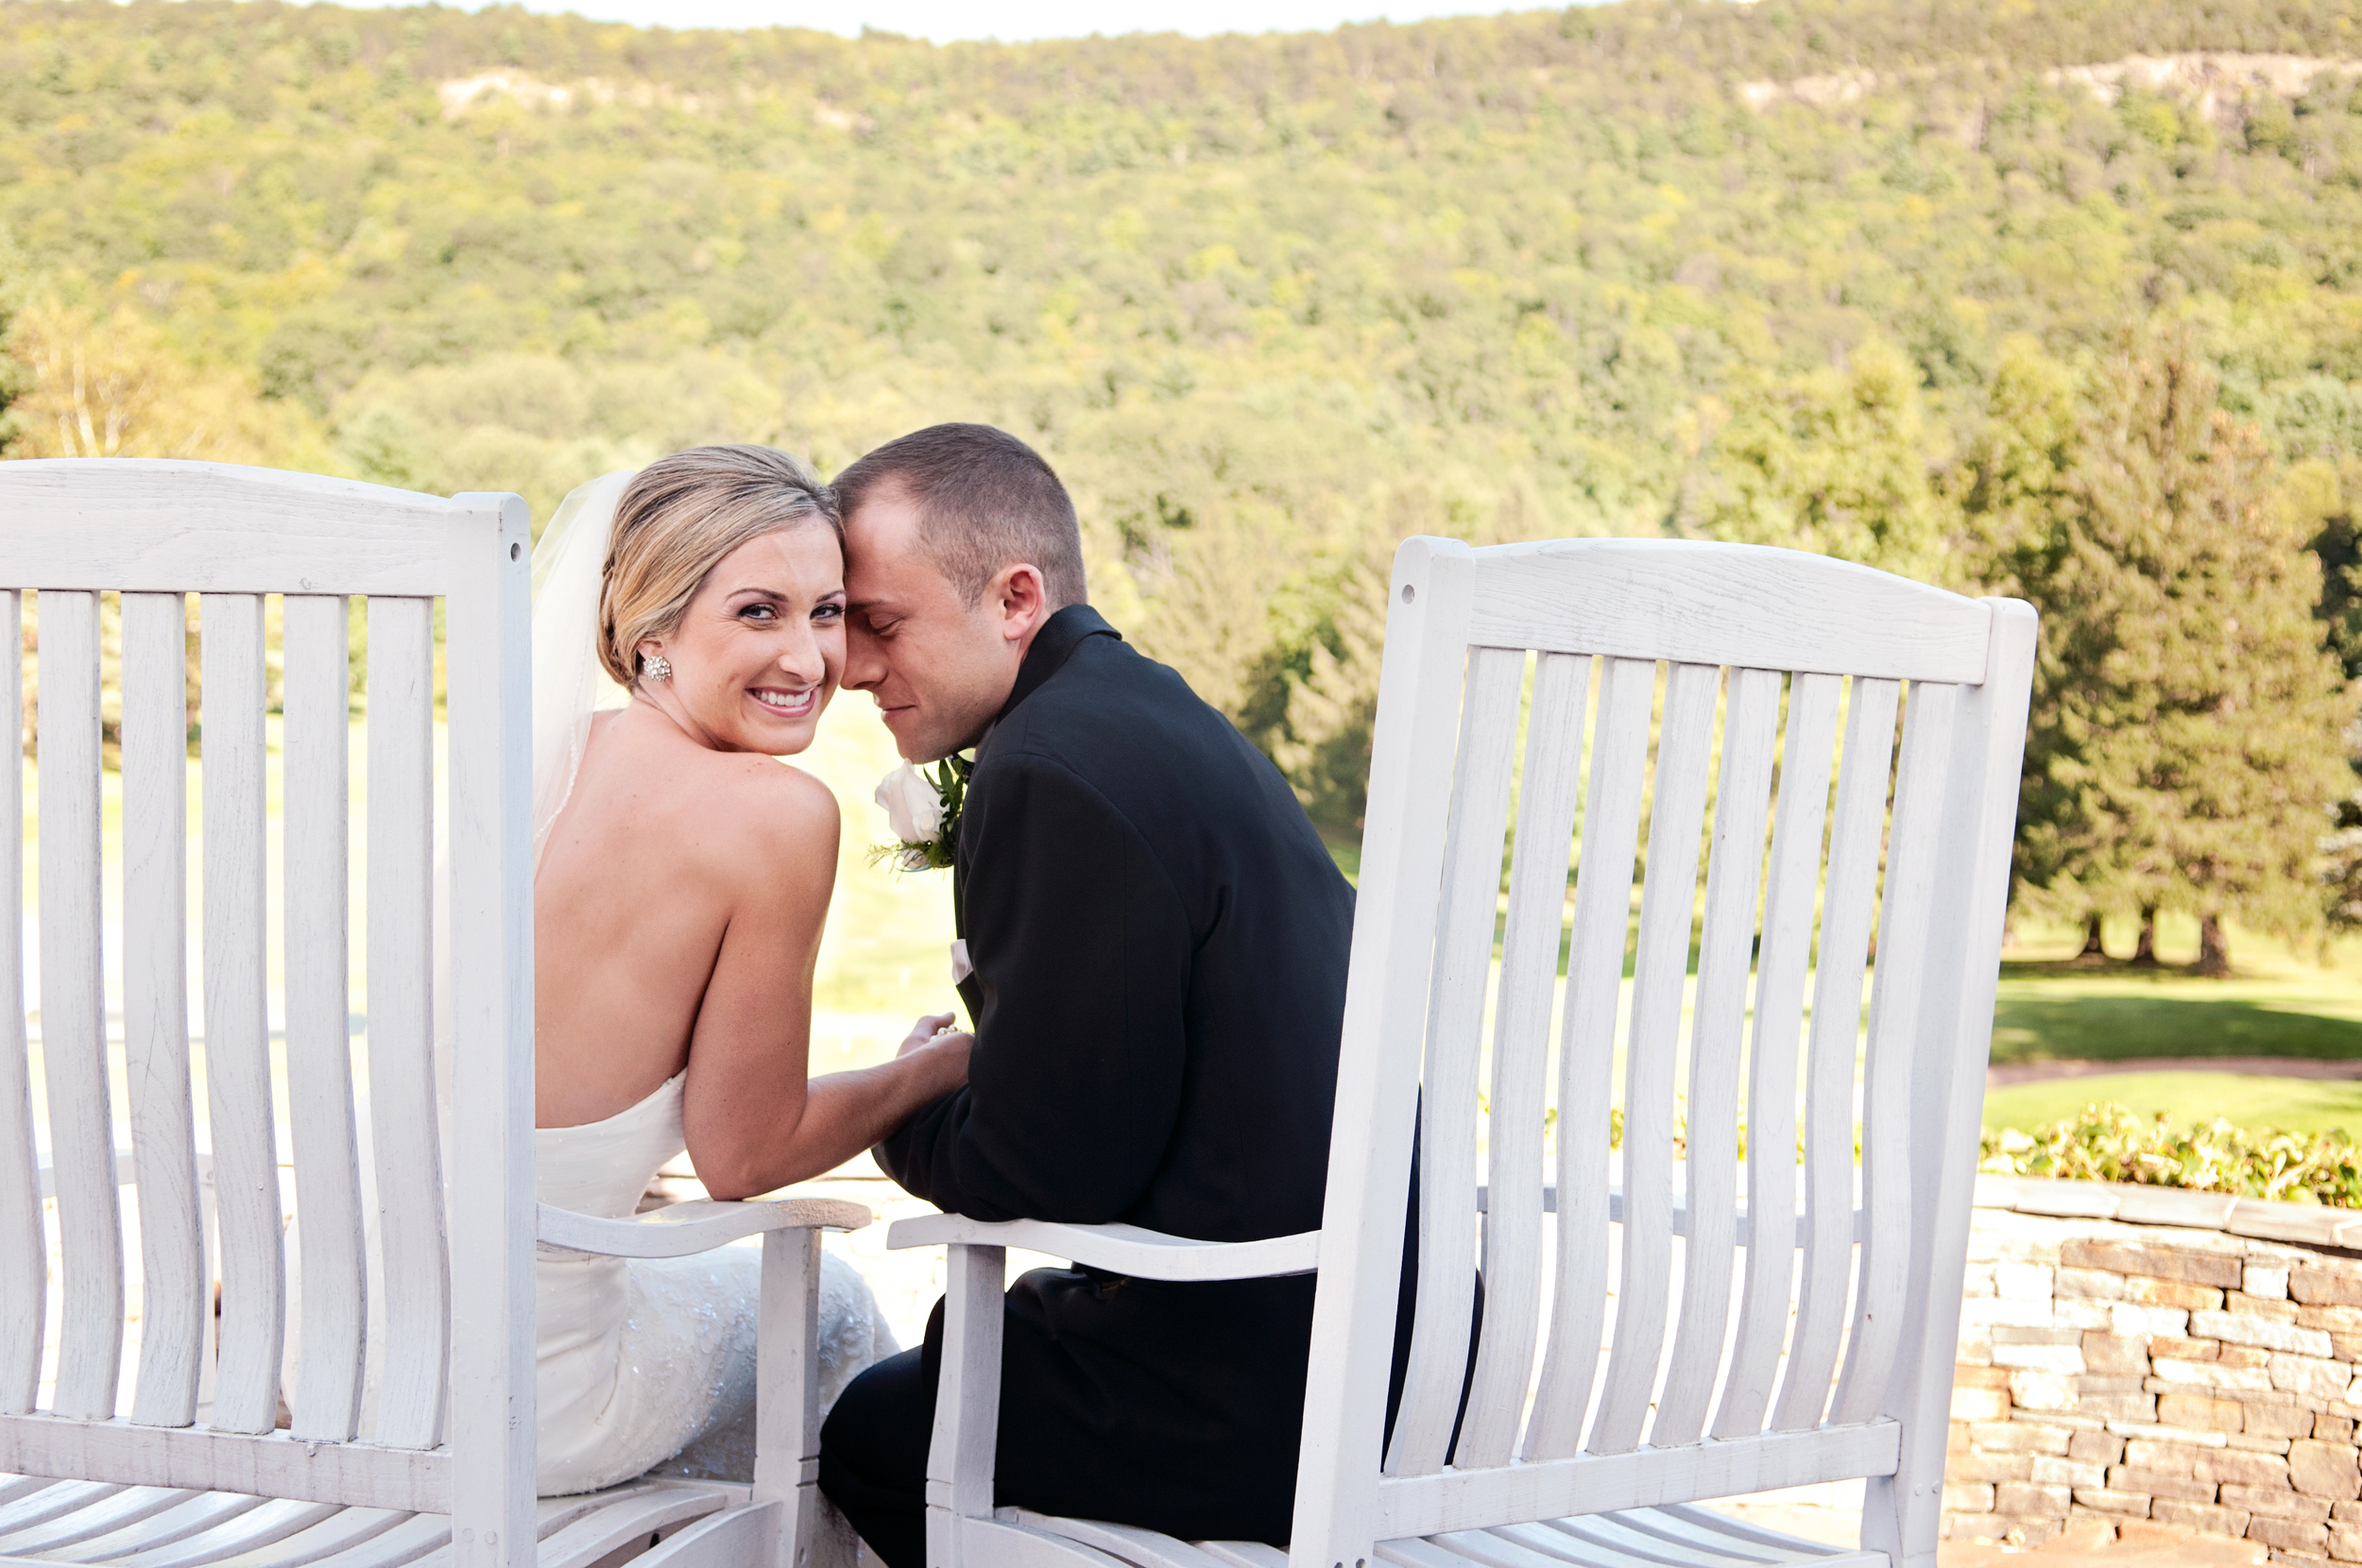 Angela_Chicoski_CT_wedding_photographer_099.jpg